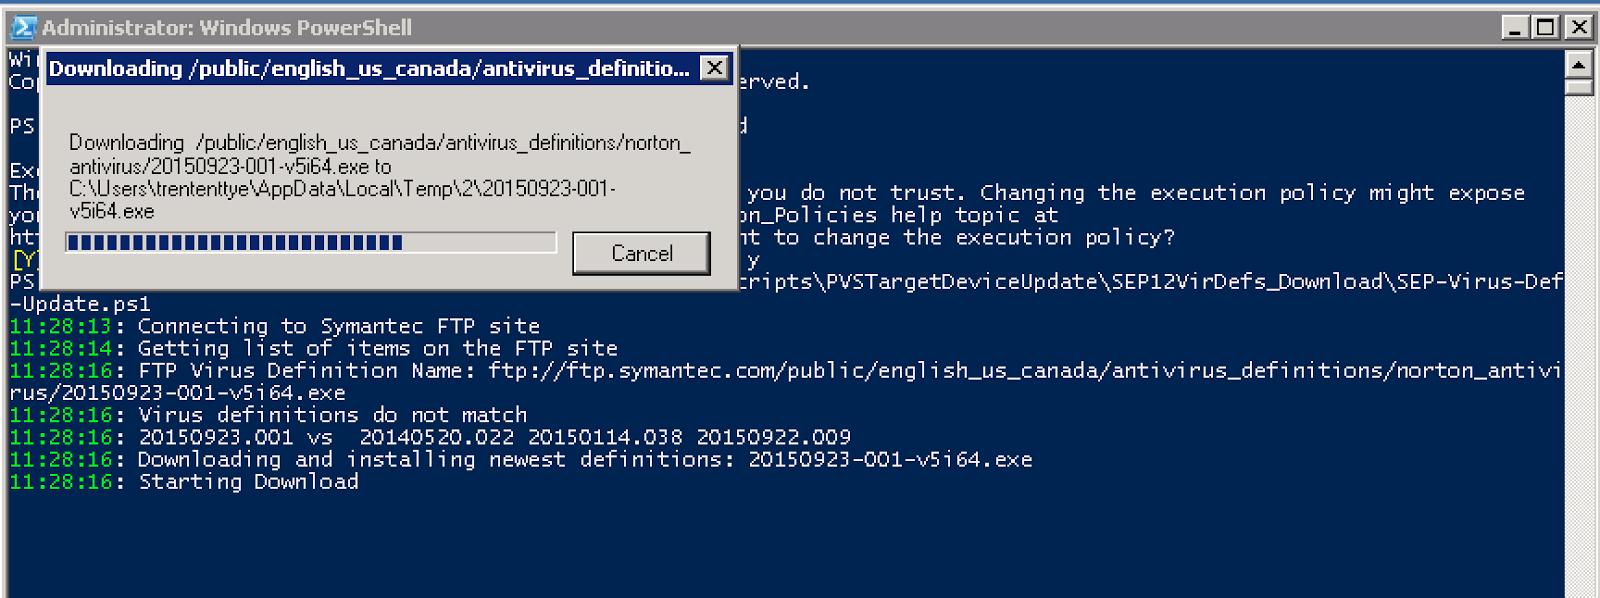 Symantec Endpoint Protection (SEP) 12 virus definition